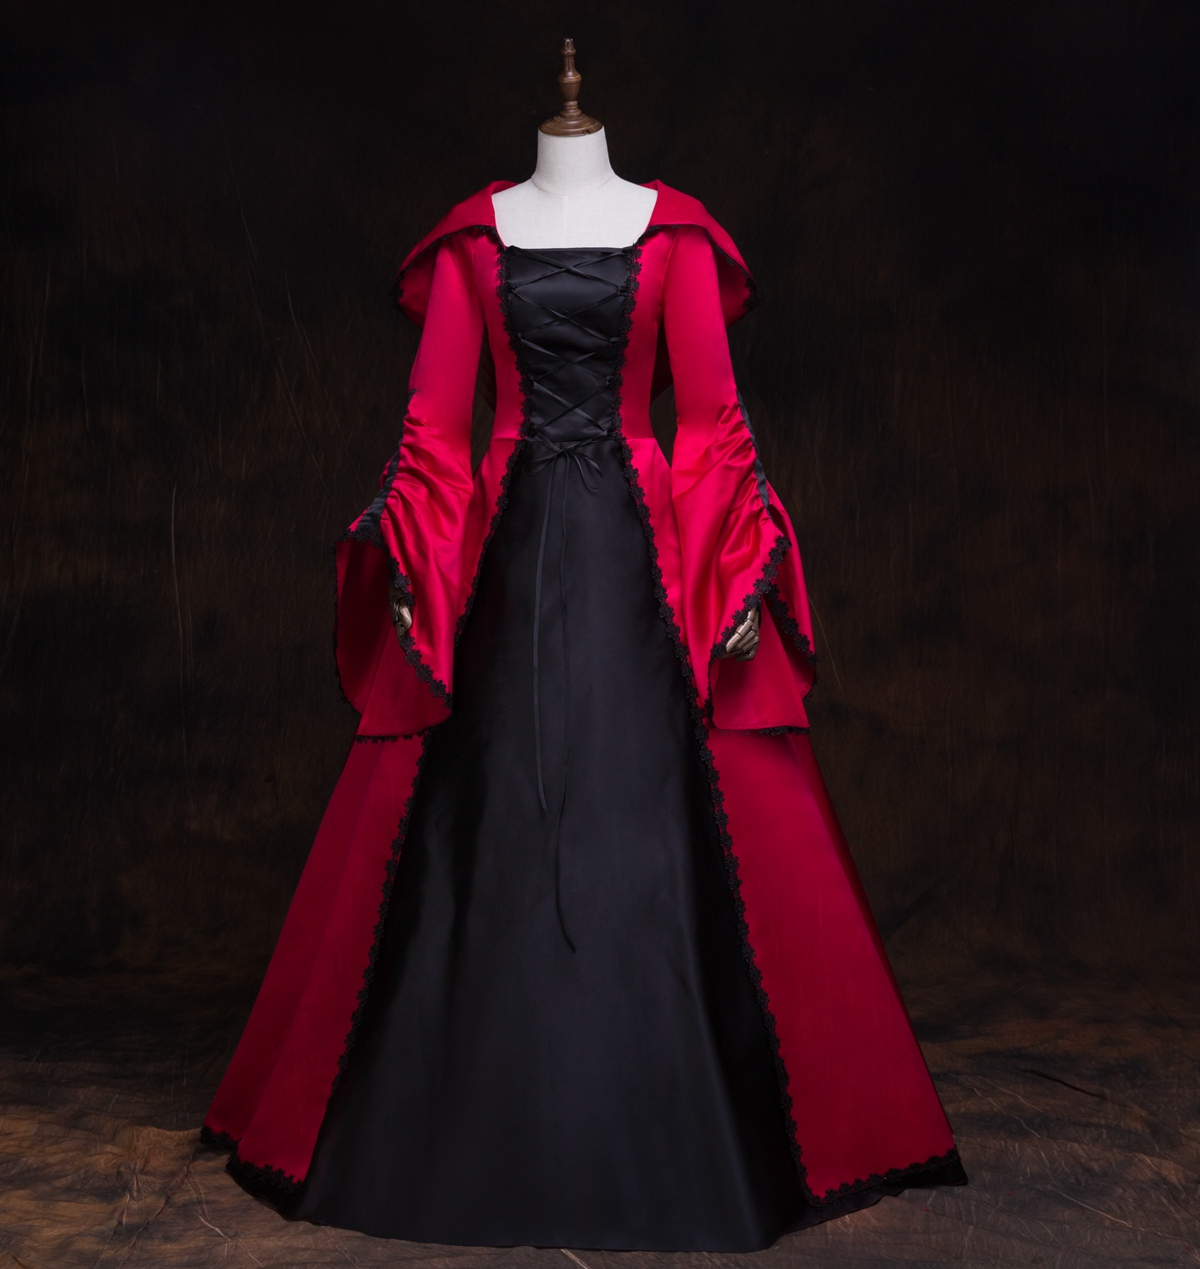 Costumes d'halloween pour femmes costumes de sorcière robe d'halloween robe gothique lolita robe victorienne costumes lolita cosplay vampire - 5